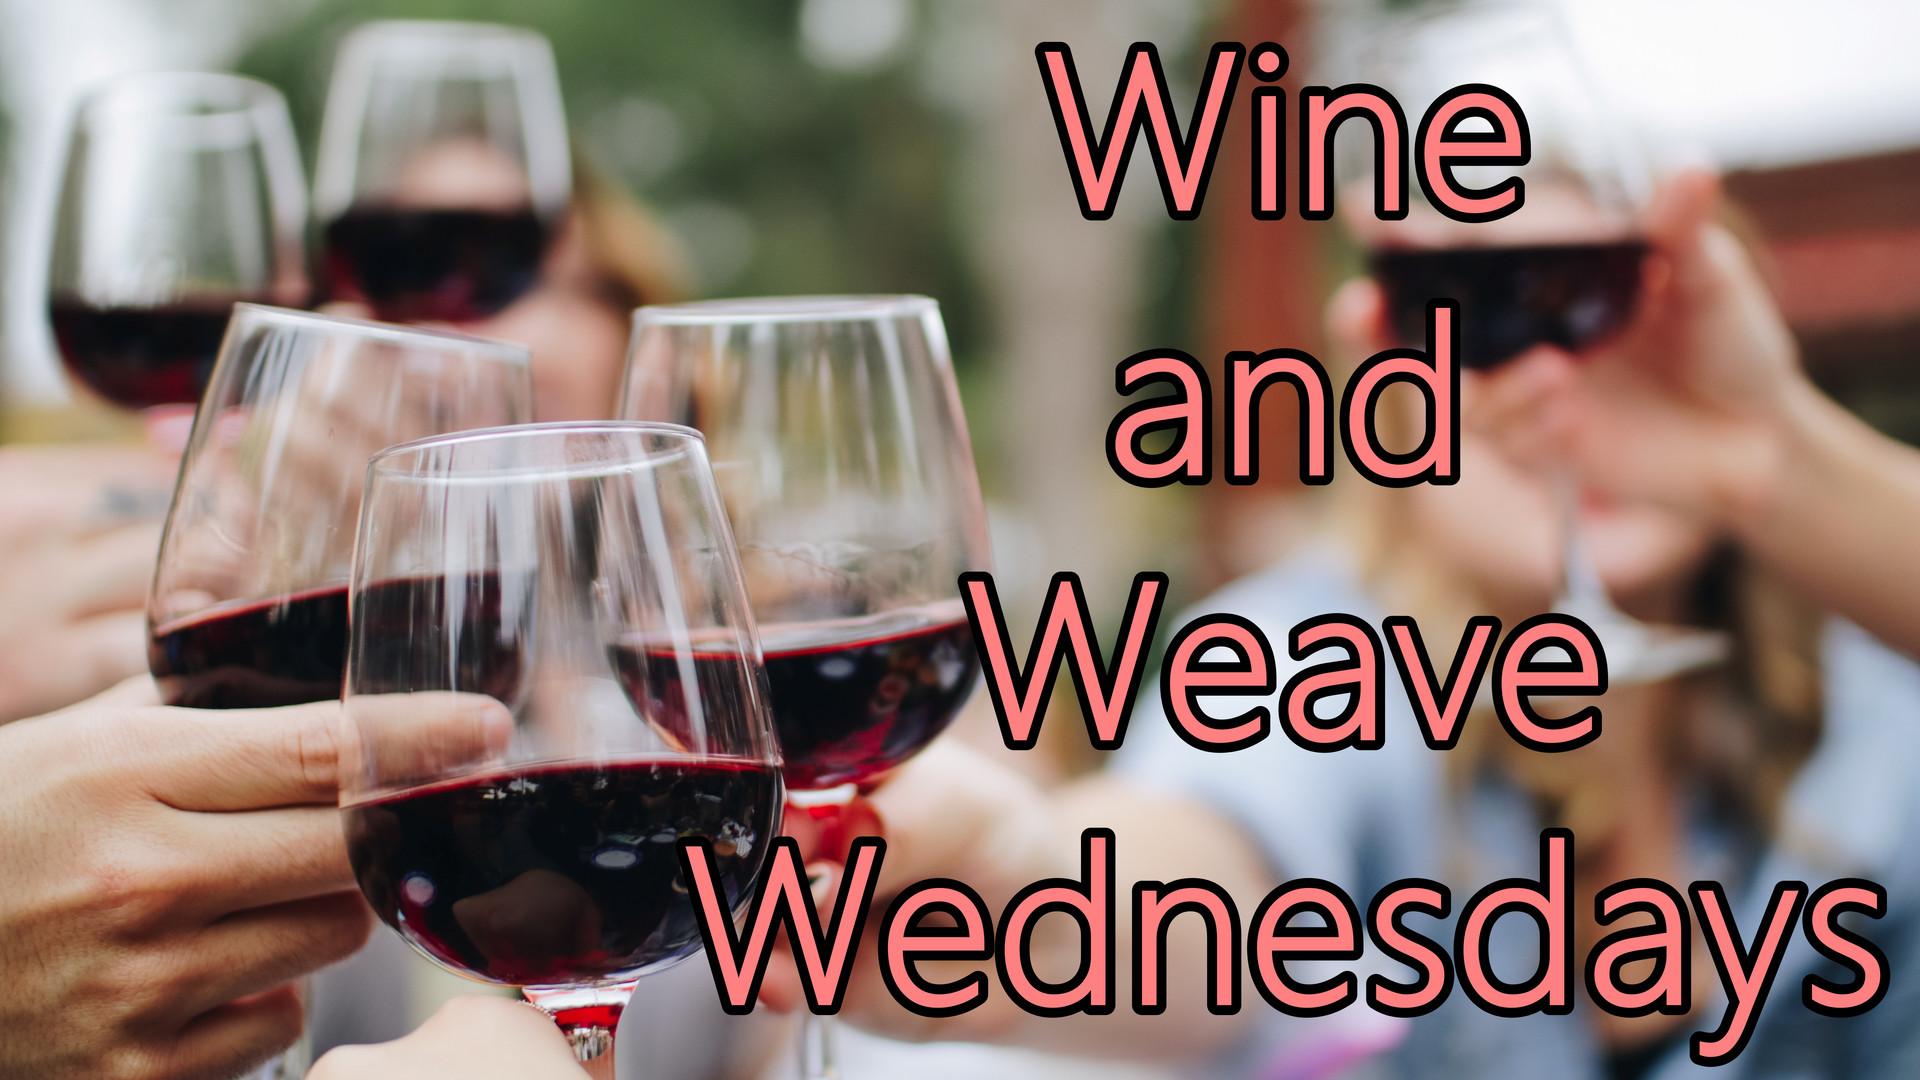 wine and weave wednesdays